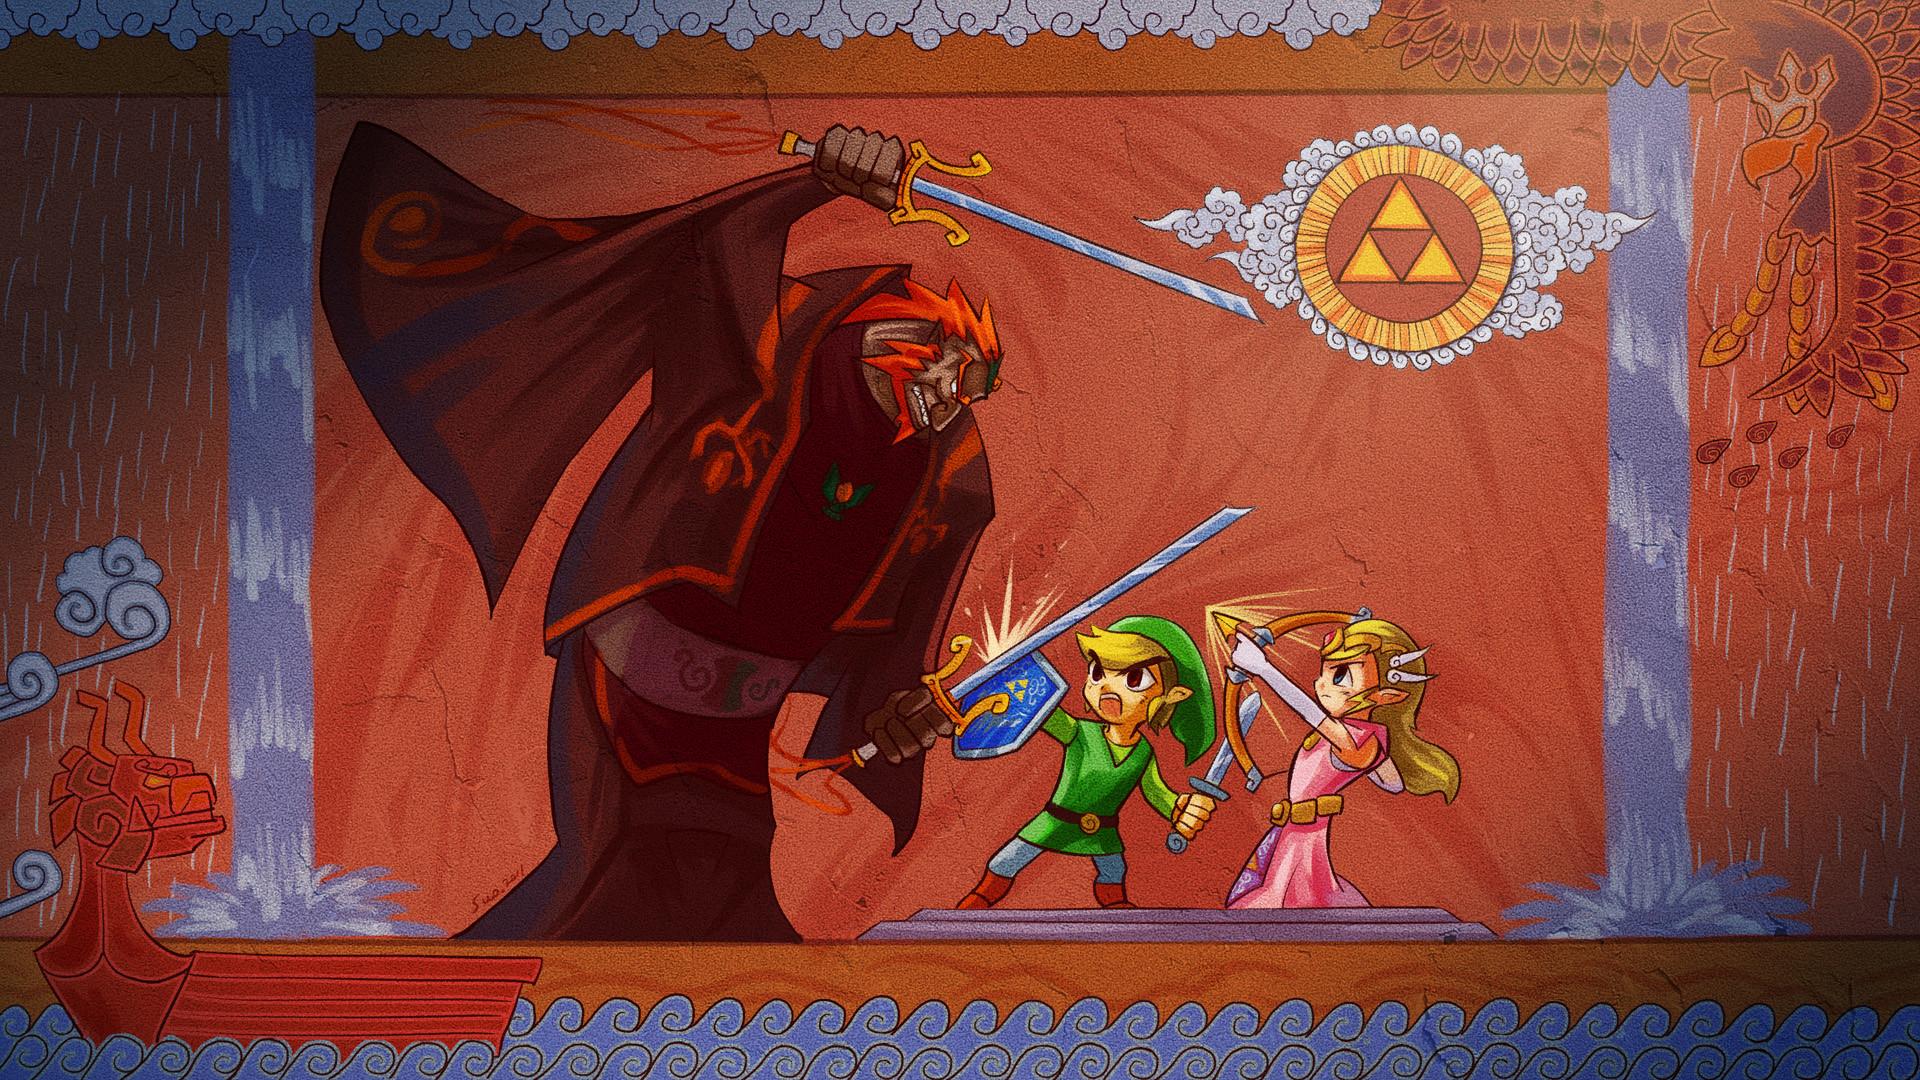 Ganondorf Zelda no Densetsu Images